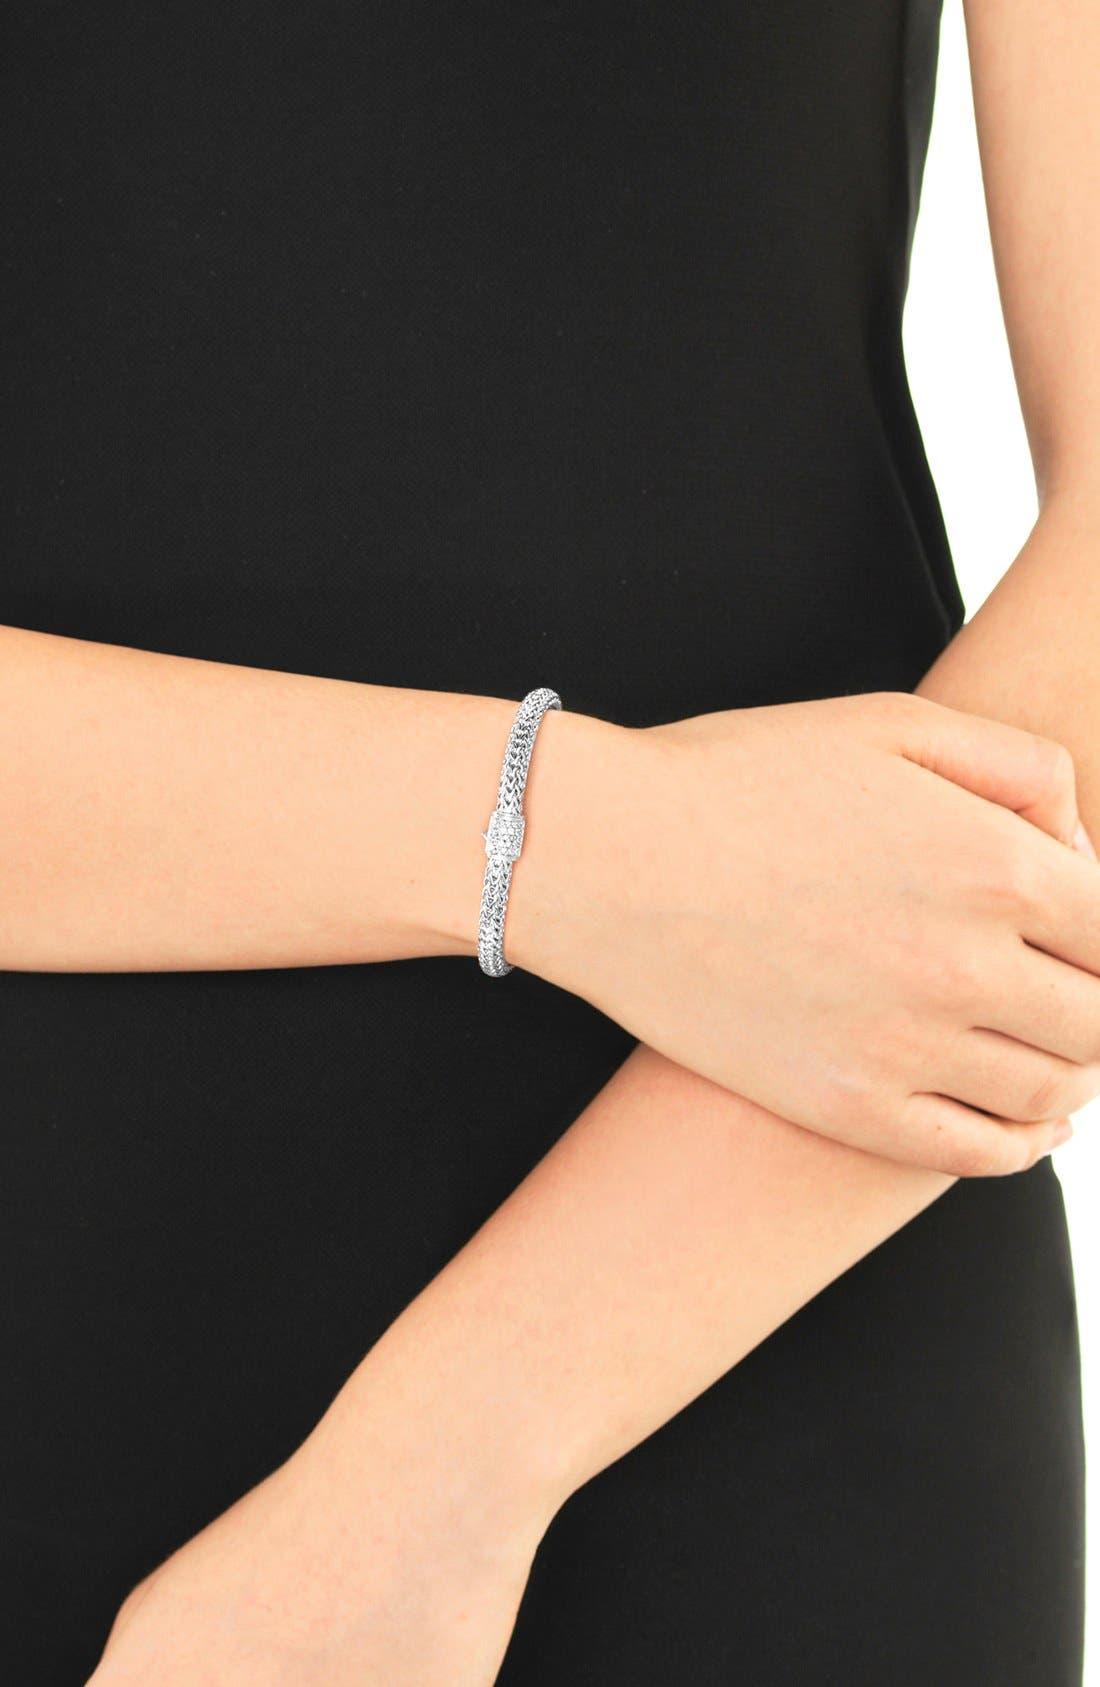 Alternate Image 3  - John Hardy Extra Small Chain Bracelet with Diamond Clasp